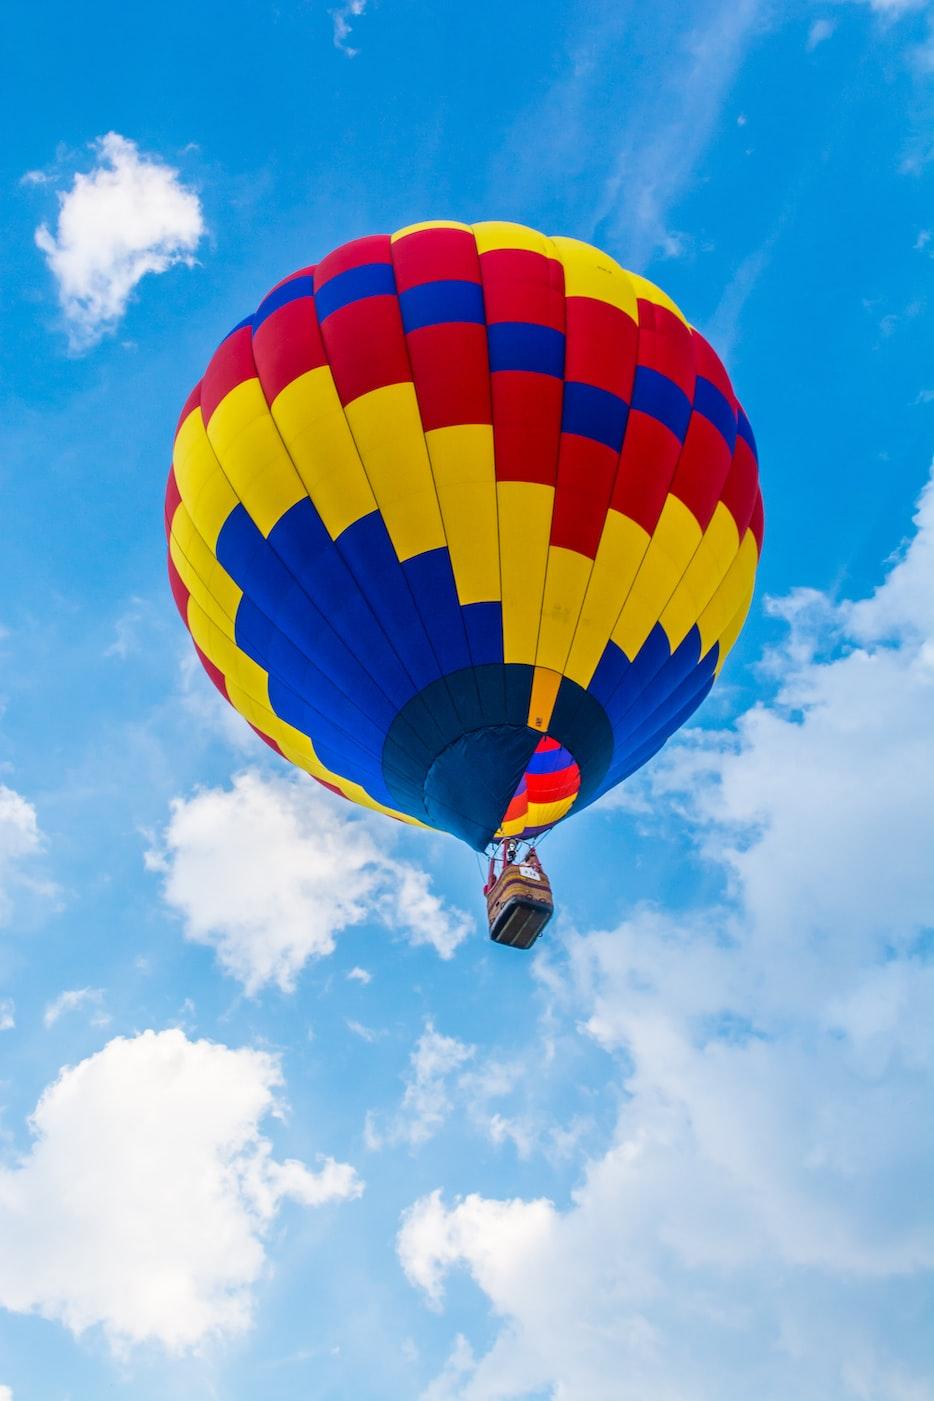 hot air balloon over Stowe, VT